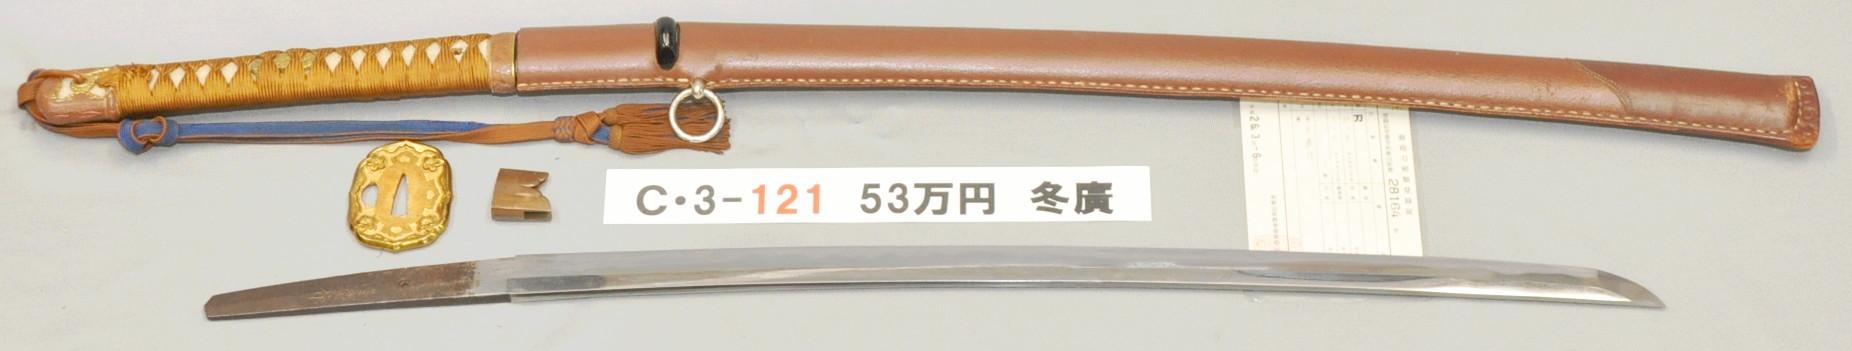 C3121